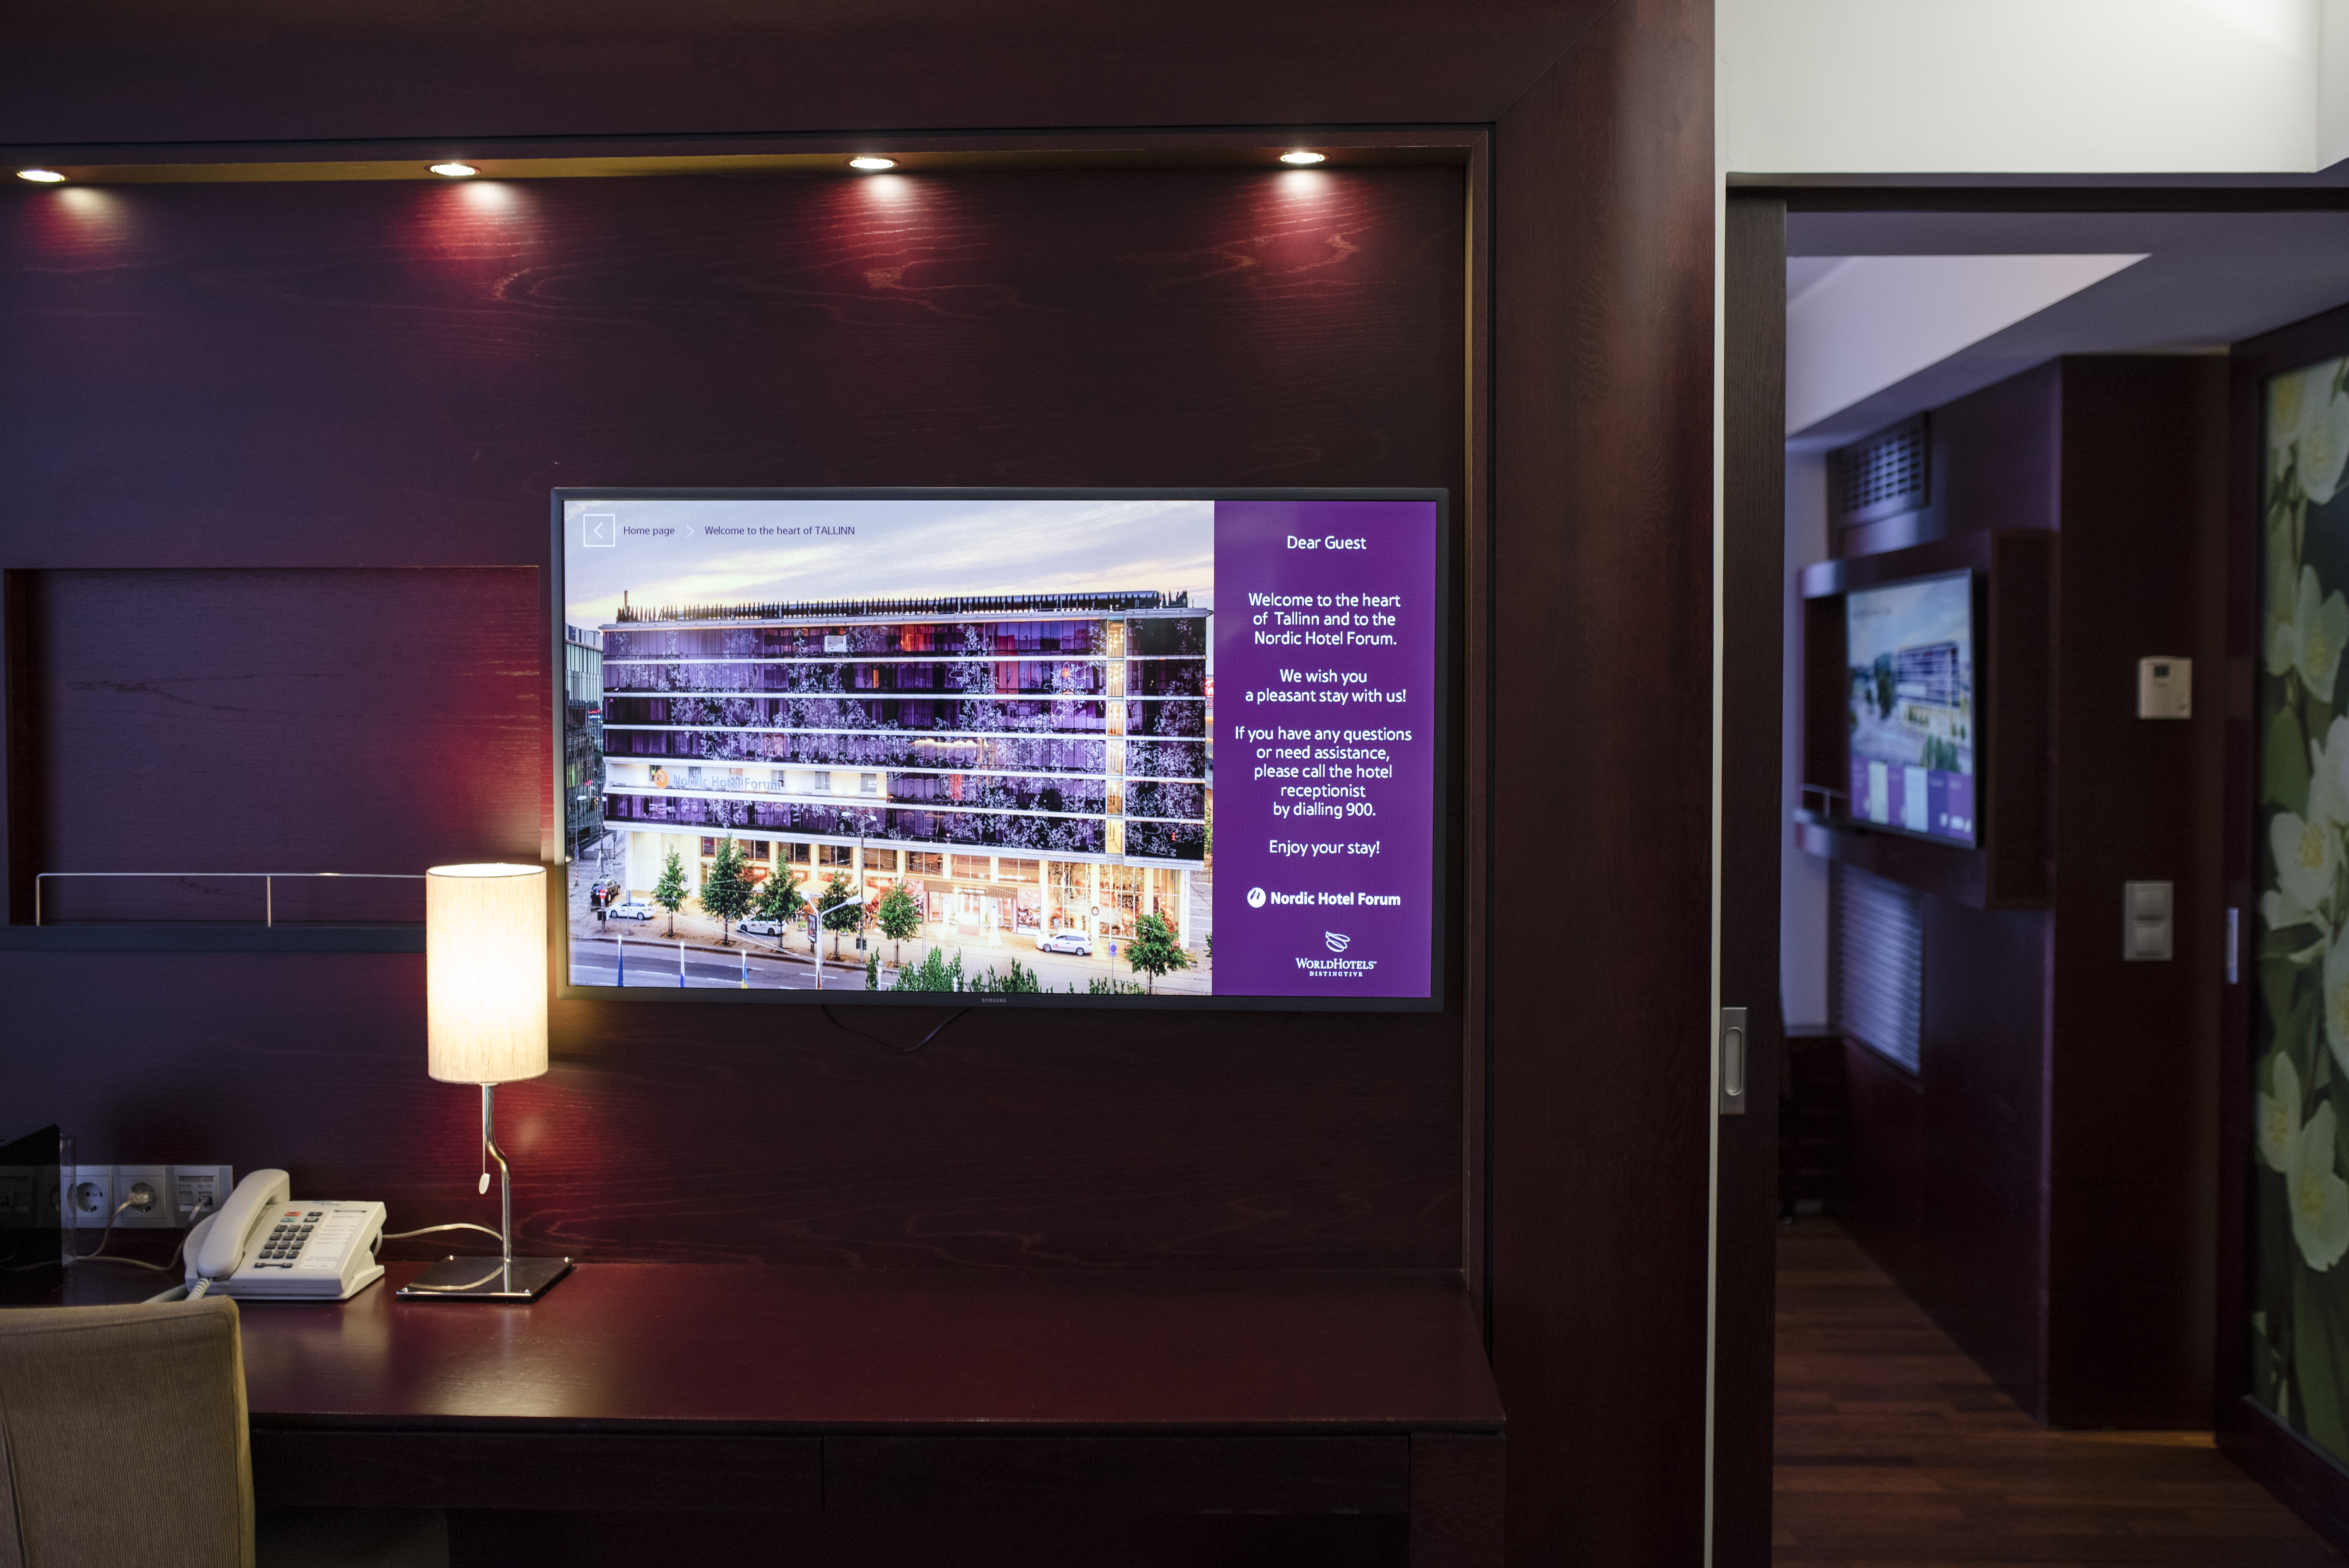 a67faa0128d Nordic Hotel Forum ekraanilahendused - Sound & Vision